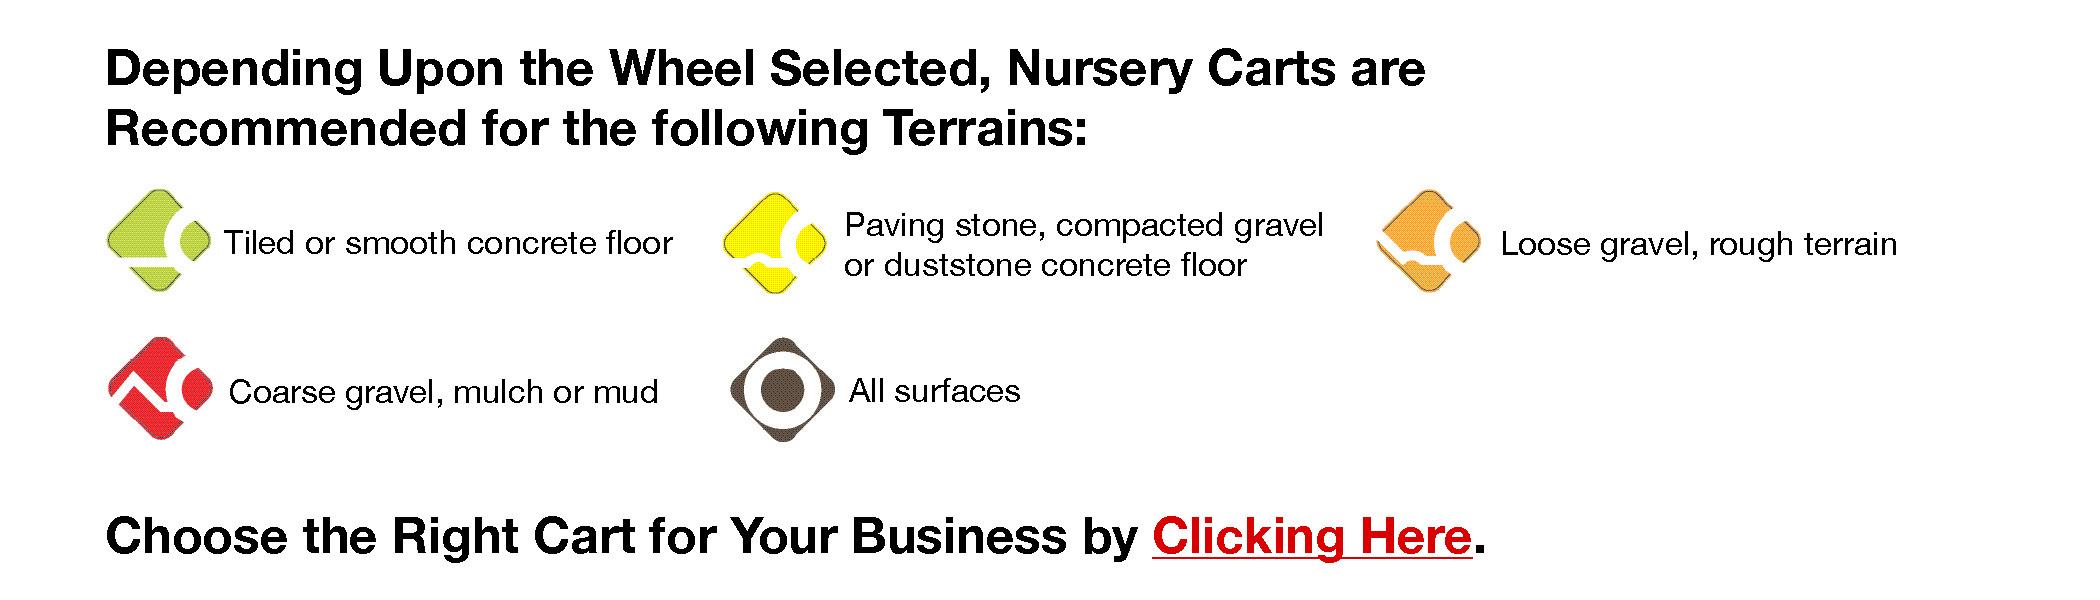 Nursery Cart Terrain Options.jpg